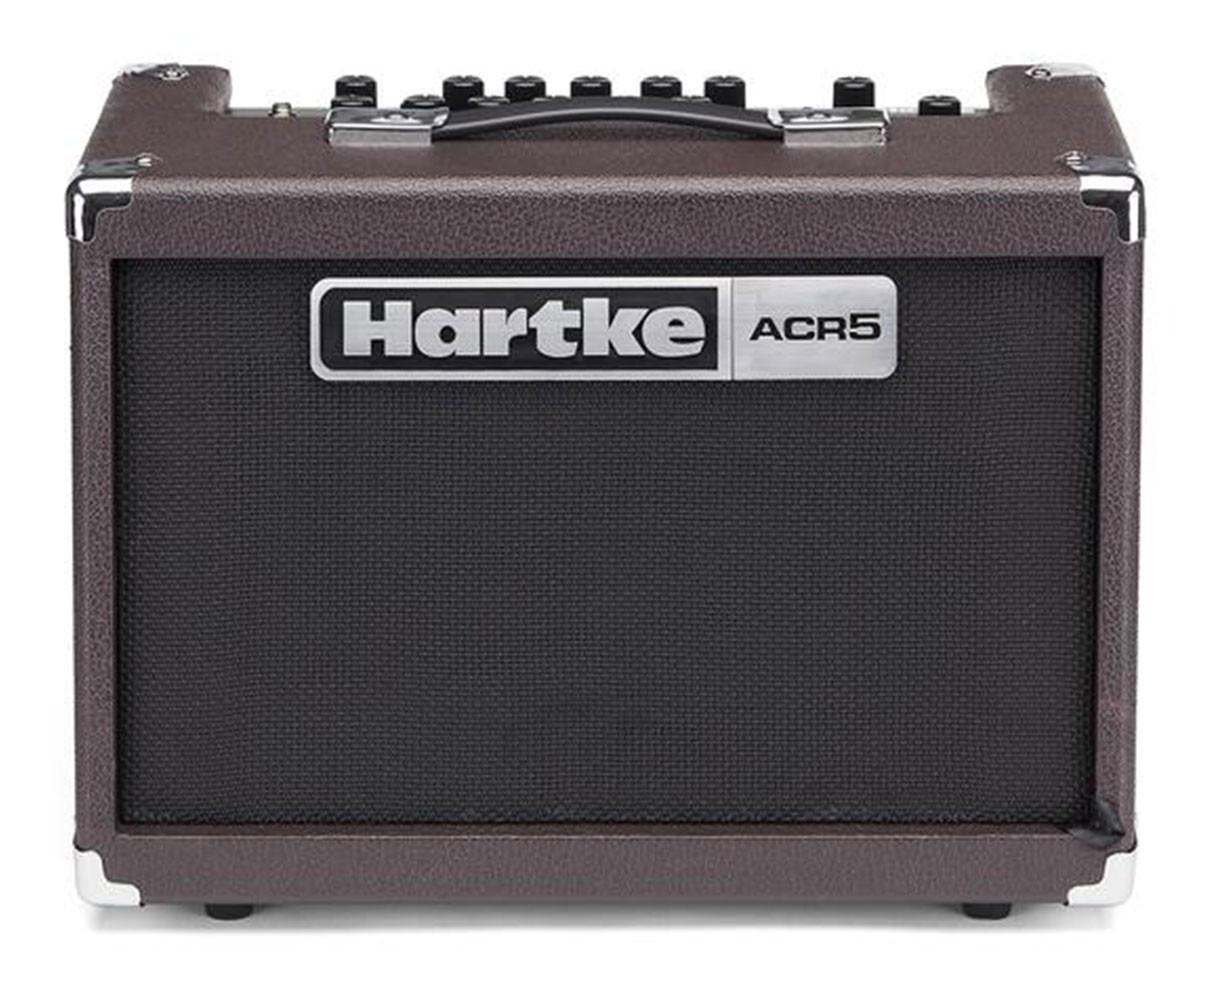 Hartke ACR5 Acoustic Guitar Amp